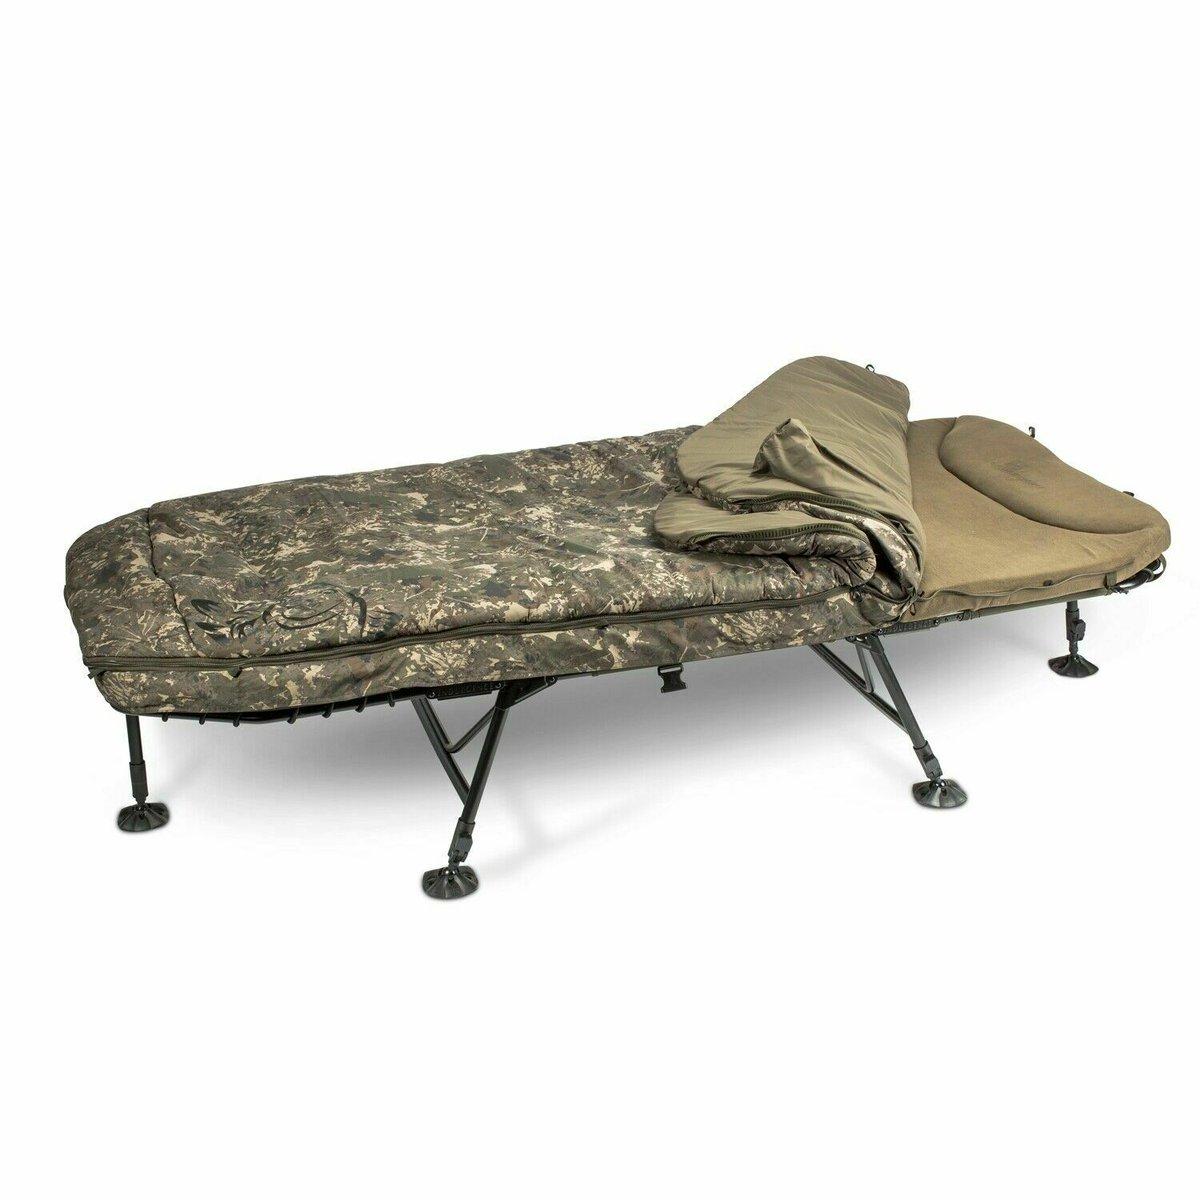 Ad - Nash MF60 Indulgence 5 Season Sleep System SS3 Wide On eBay here -->> https://t.co/ERy6Ss